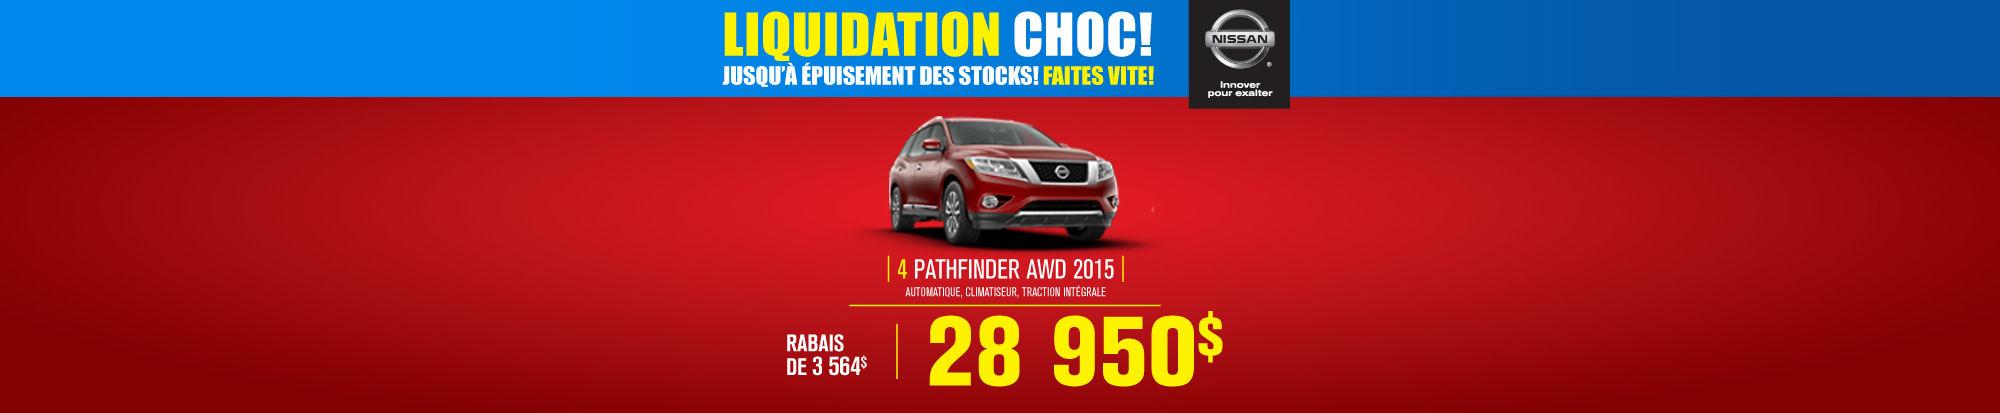 Liquidation choc Pathfinder 2015